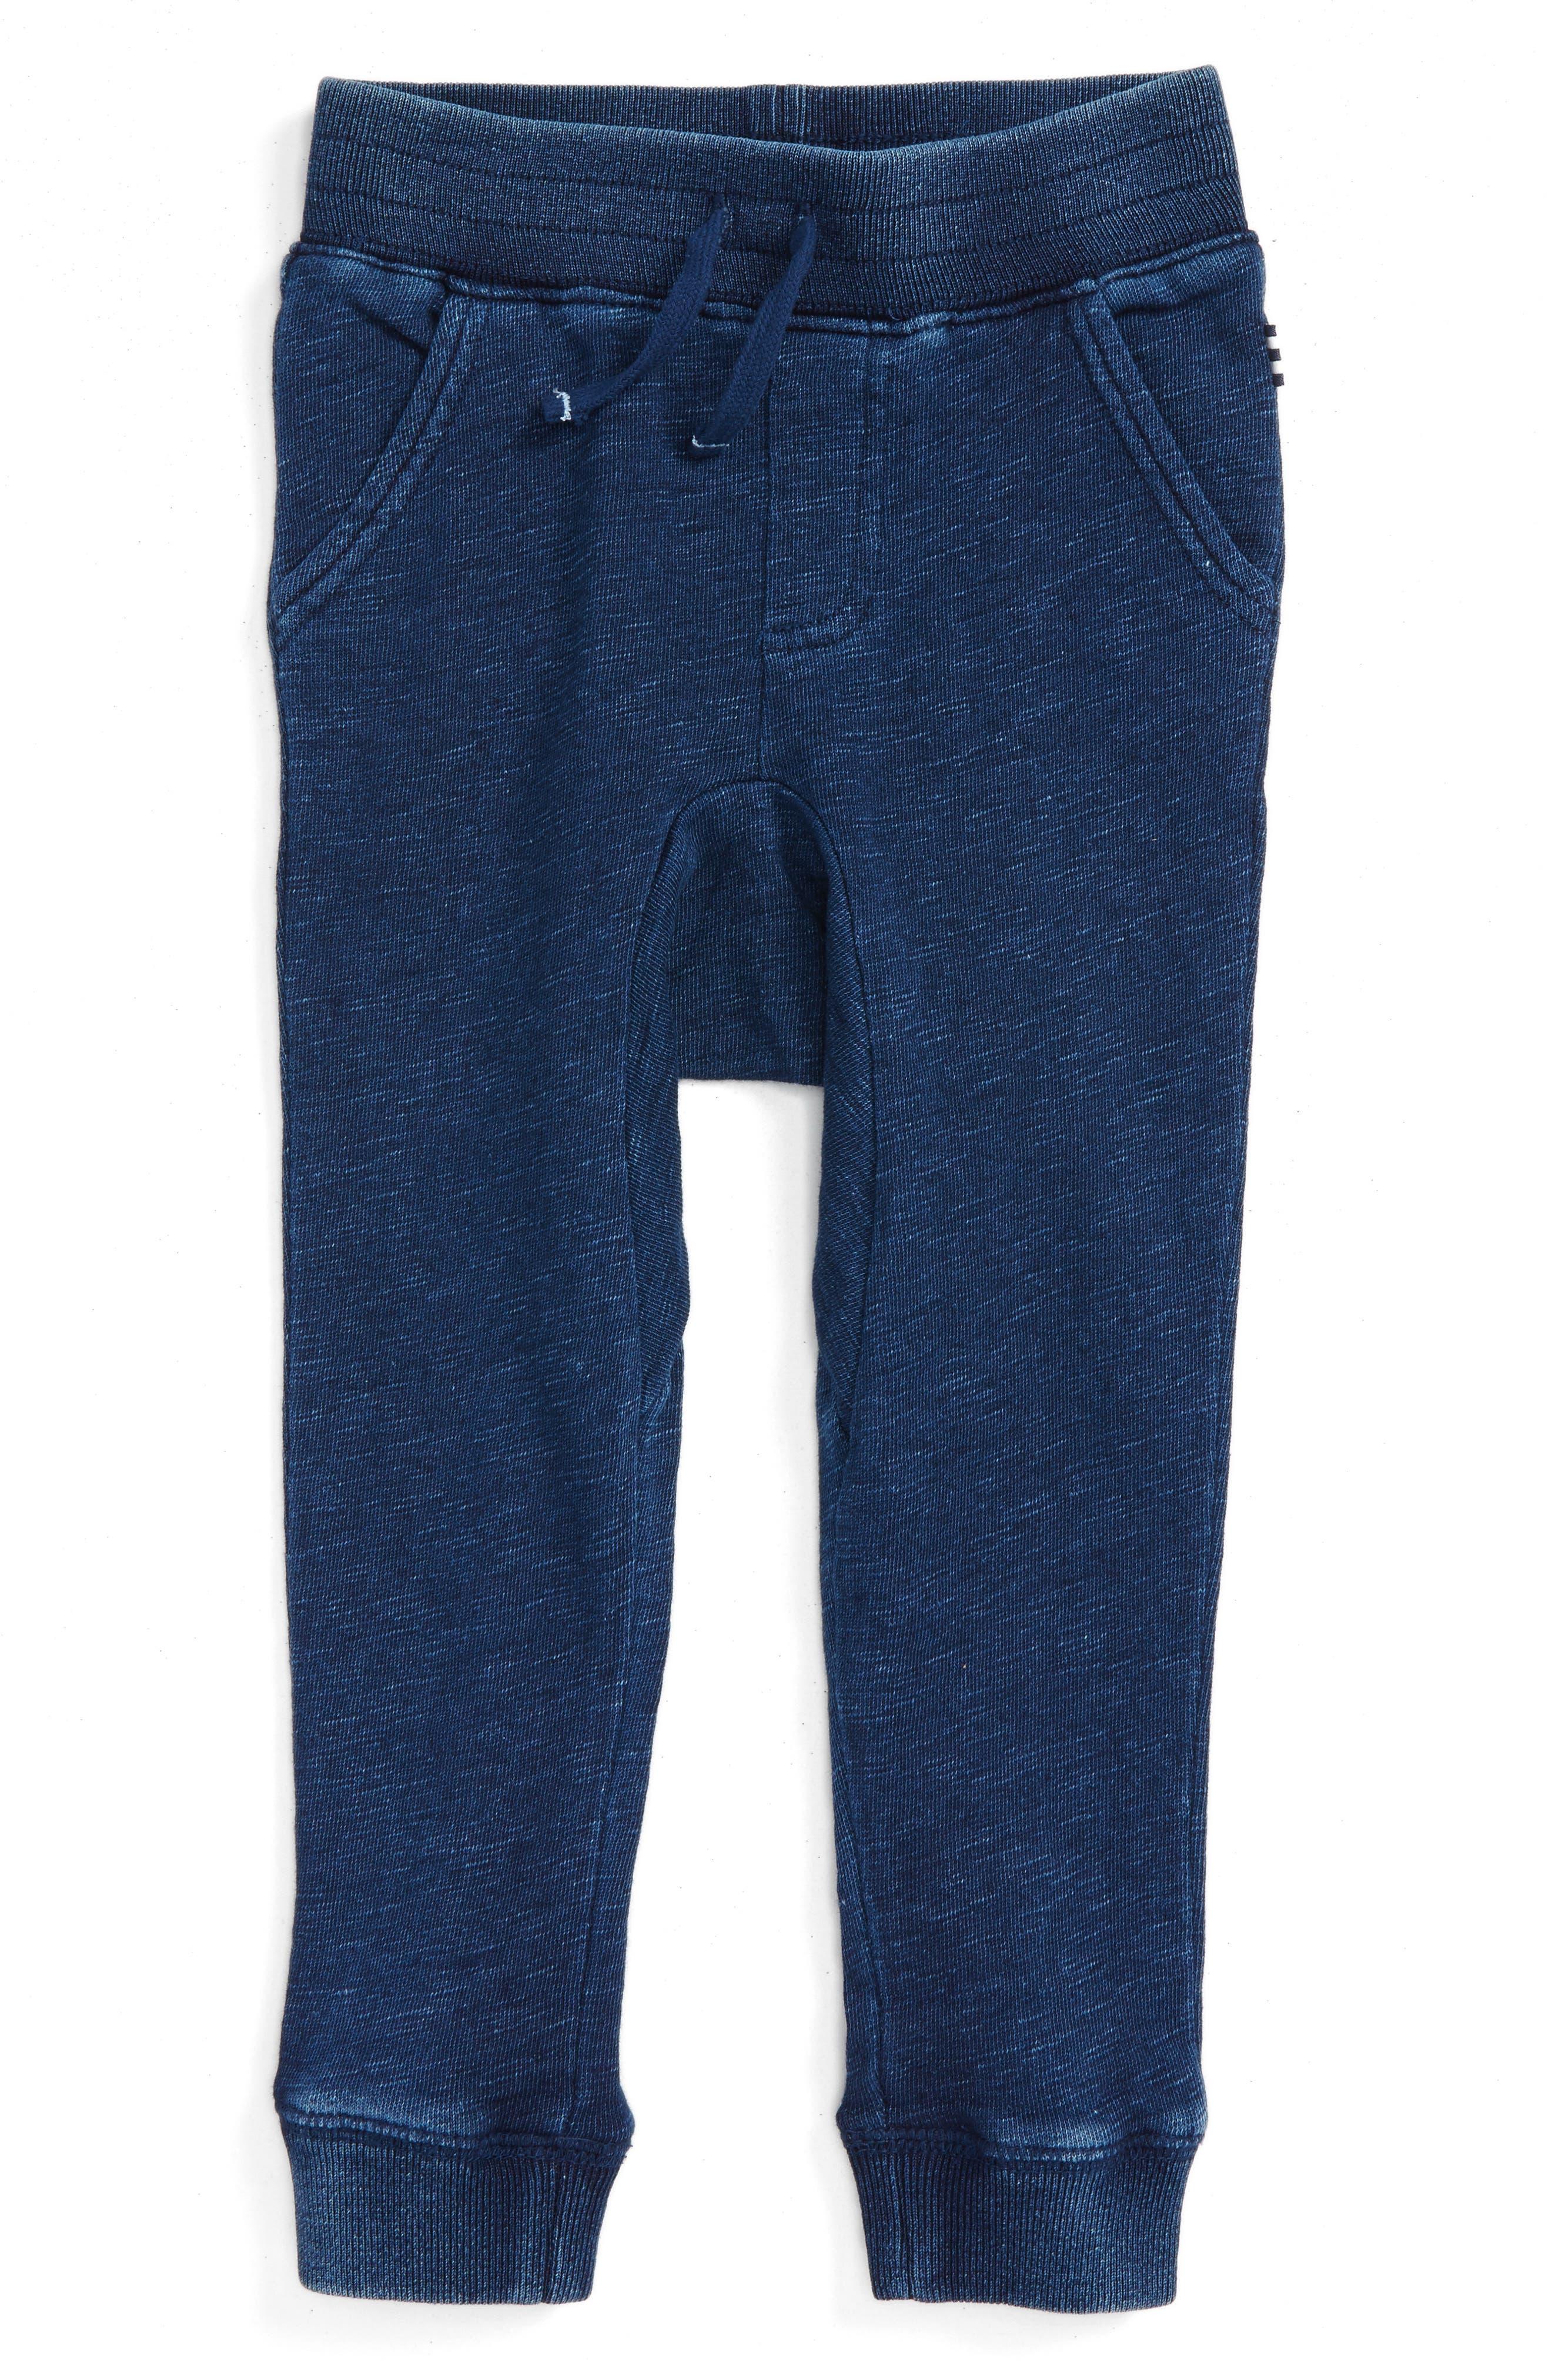 Splendid Double Knit Jogger Pants (Toddler Boys & Little Boys)